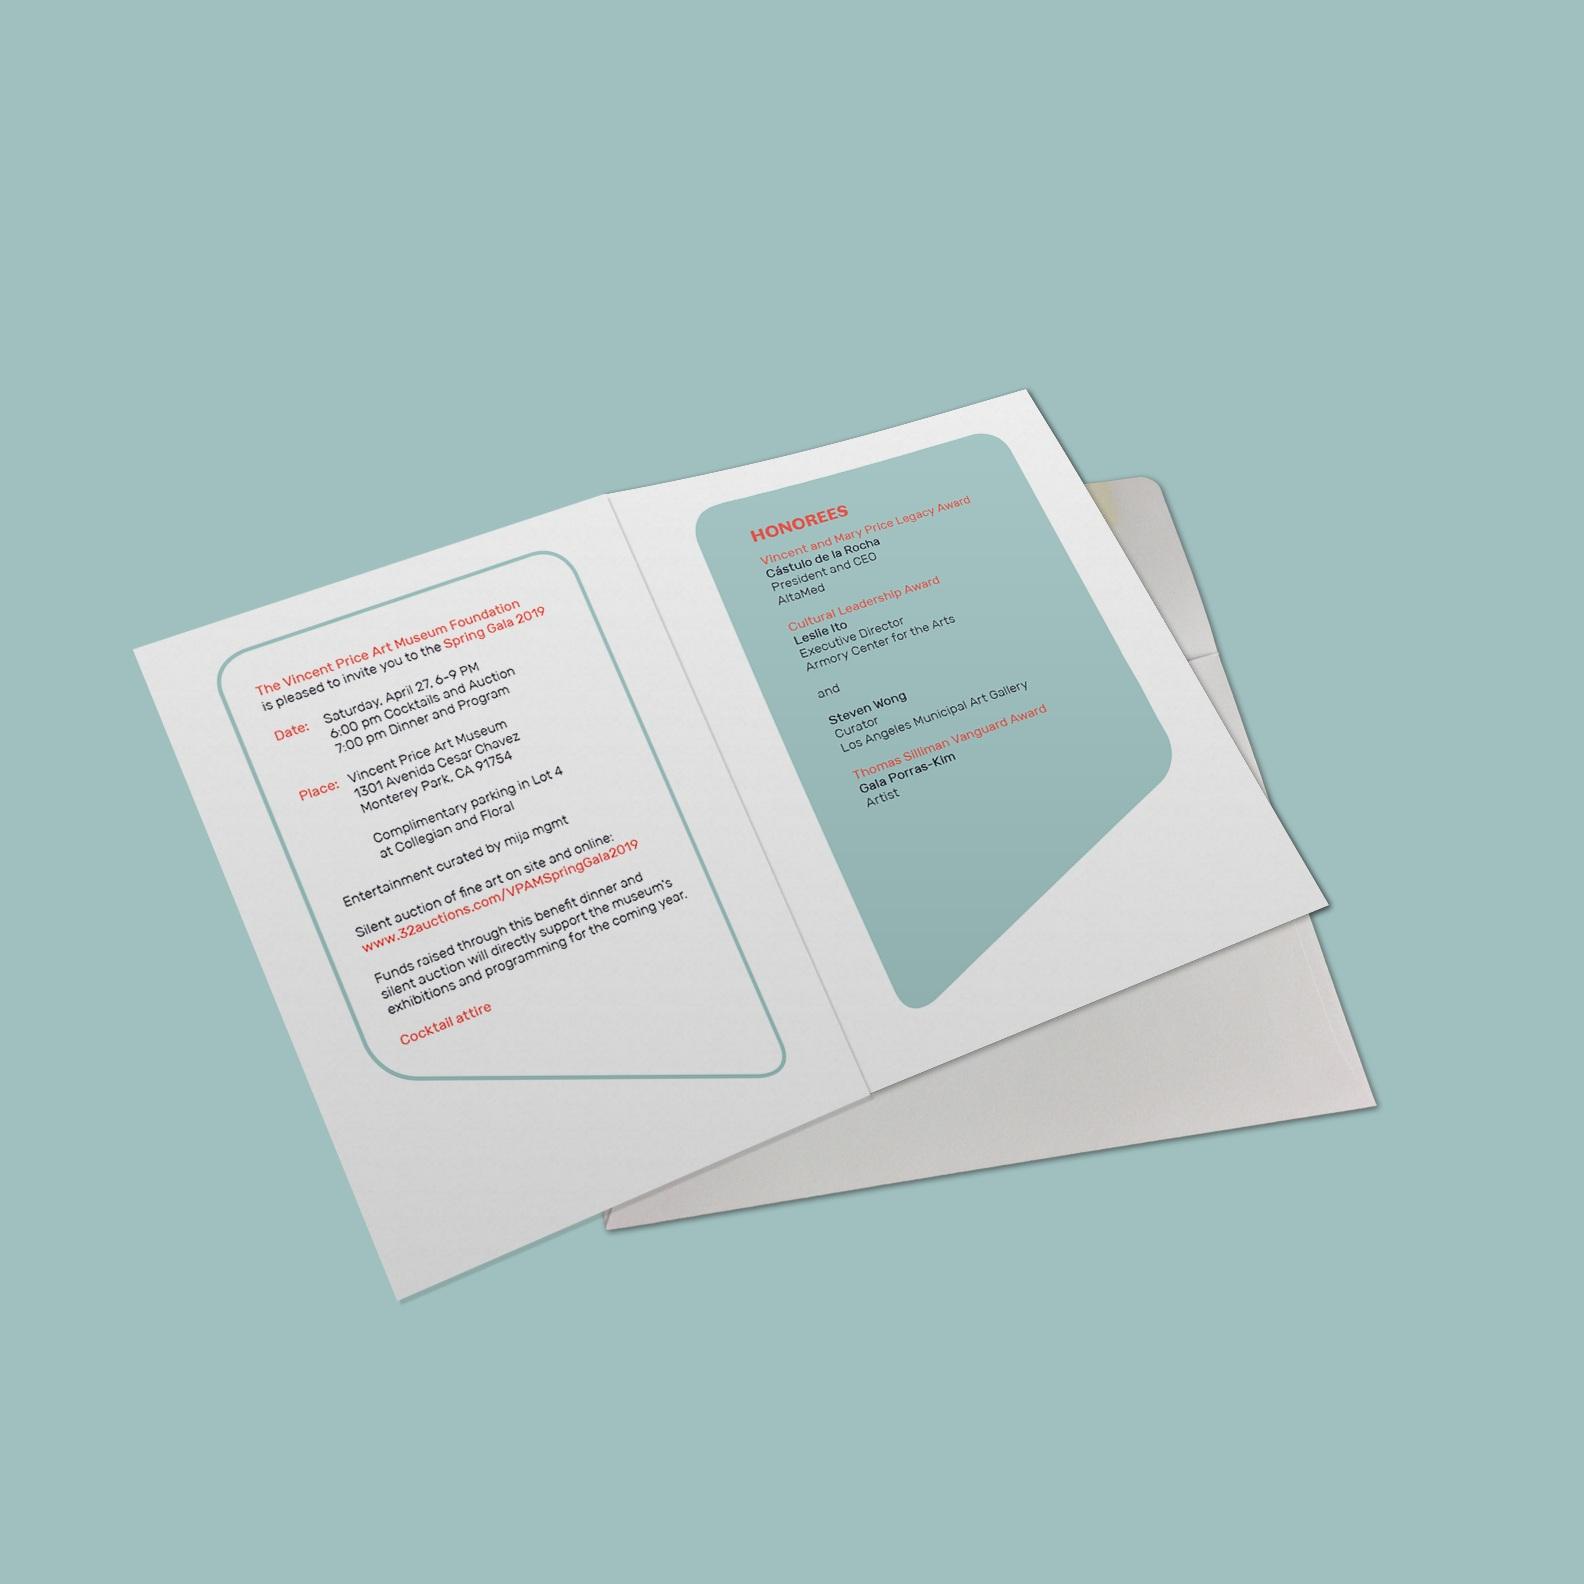 INVITATION-Mockup_VPAM-GALA-2019-Inside.png